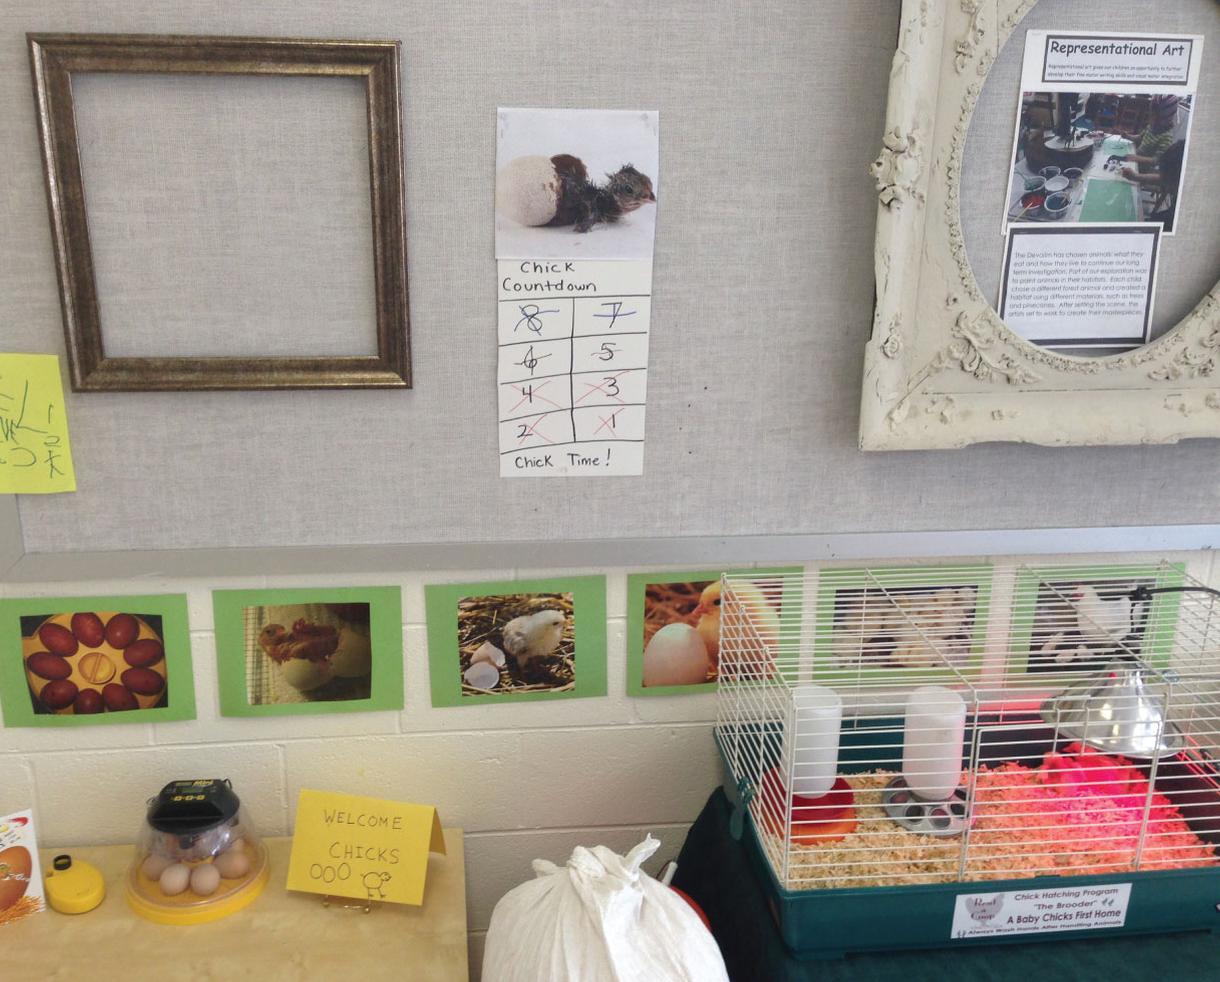 NJ/NY/PA 4 Week Chick Hatching Rental from RentACoop